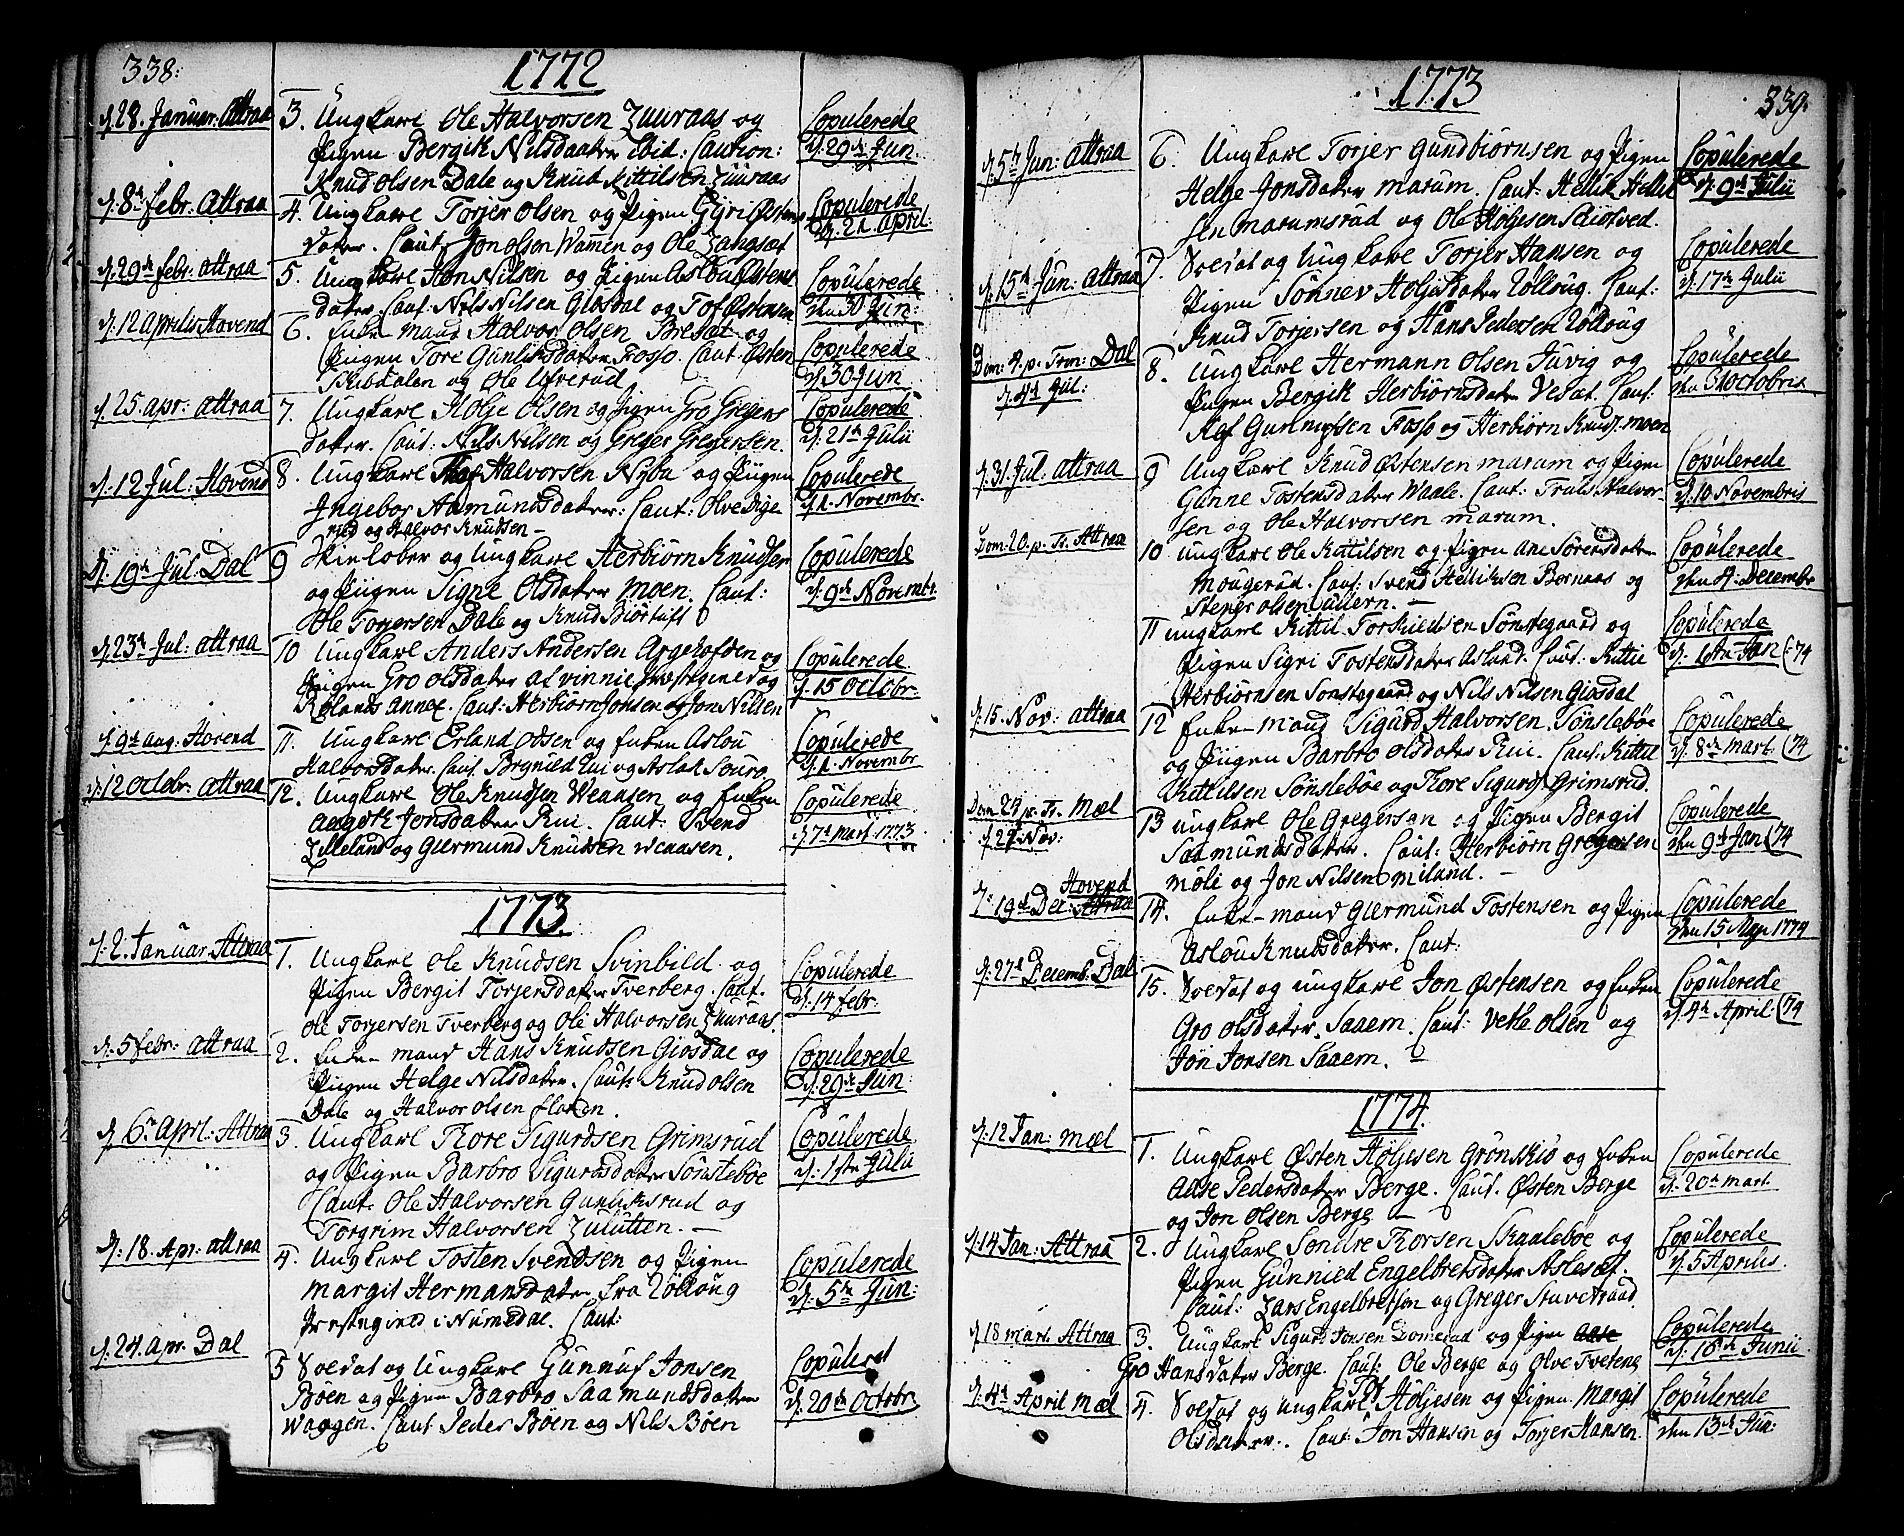 SAKO, Tinn kirkebøker, F/Fa/L0002: Ministerialbok nr. I 2, 1757-1810, s. 338-339